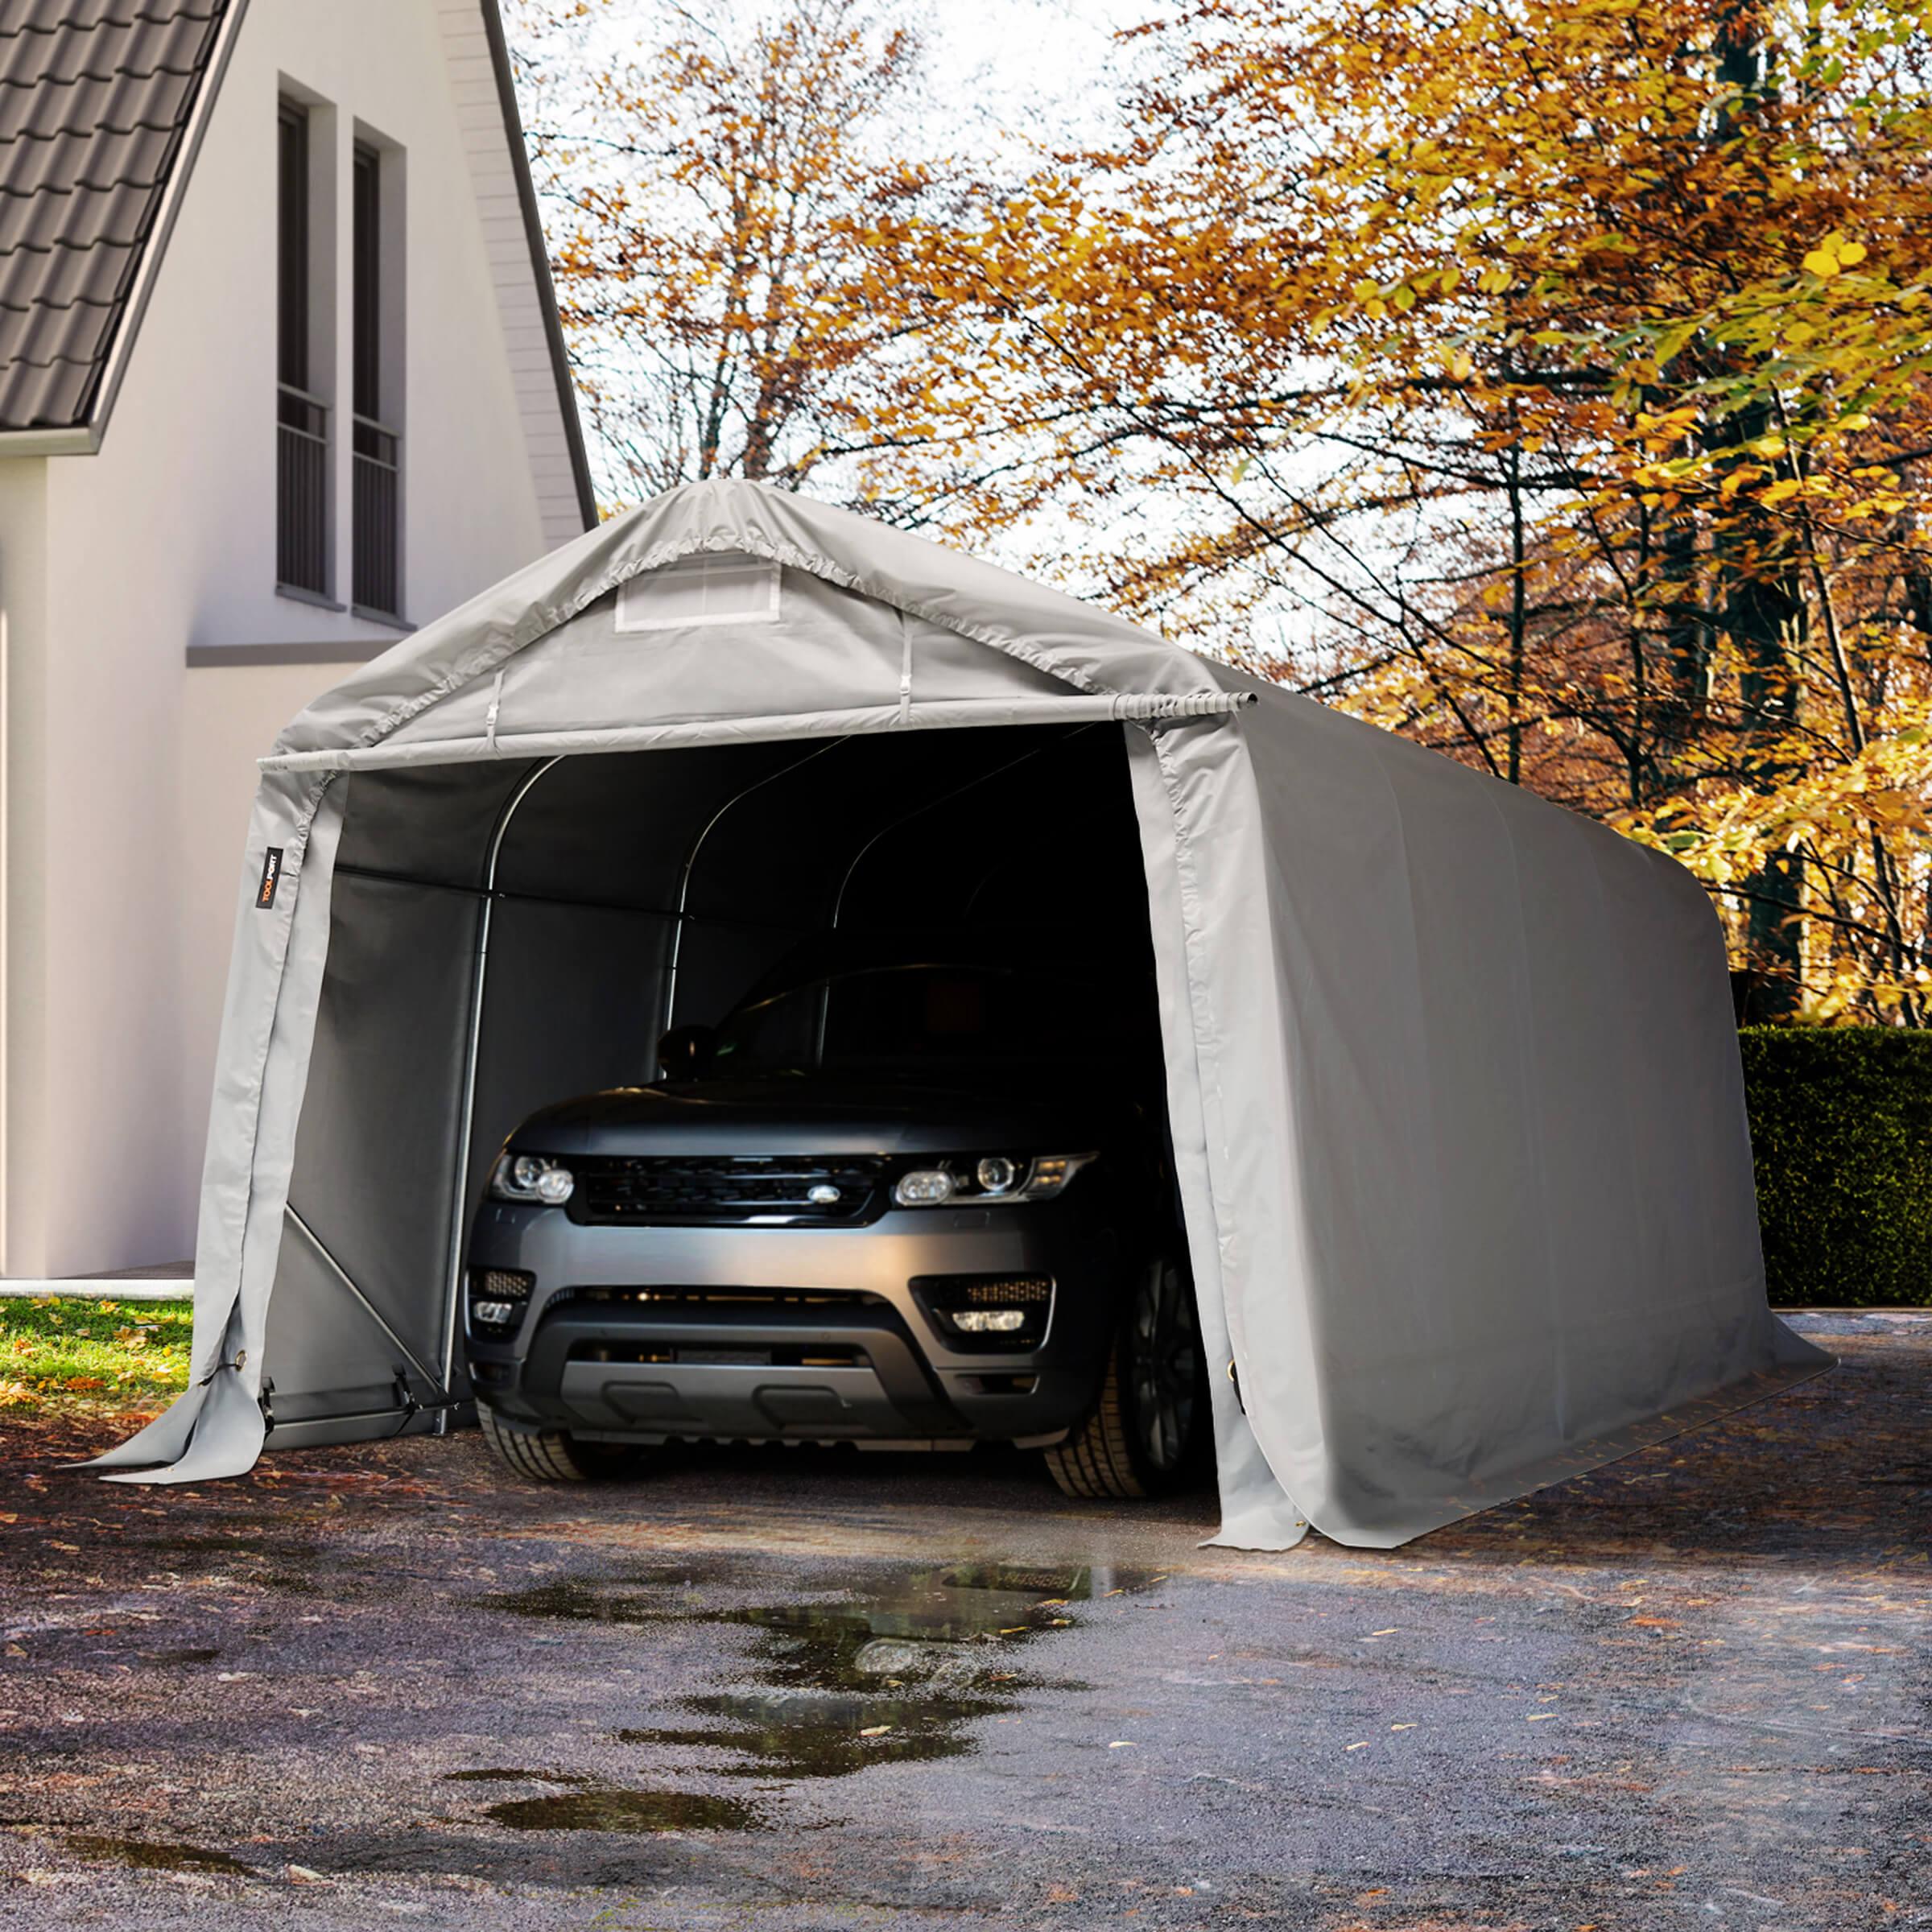 TOOLPORT Portable Garage 3,3x6,0m PVC 720 g/m² grey waterproof